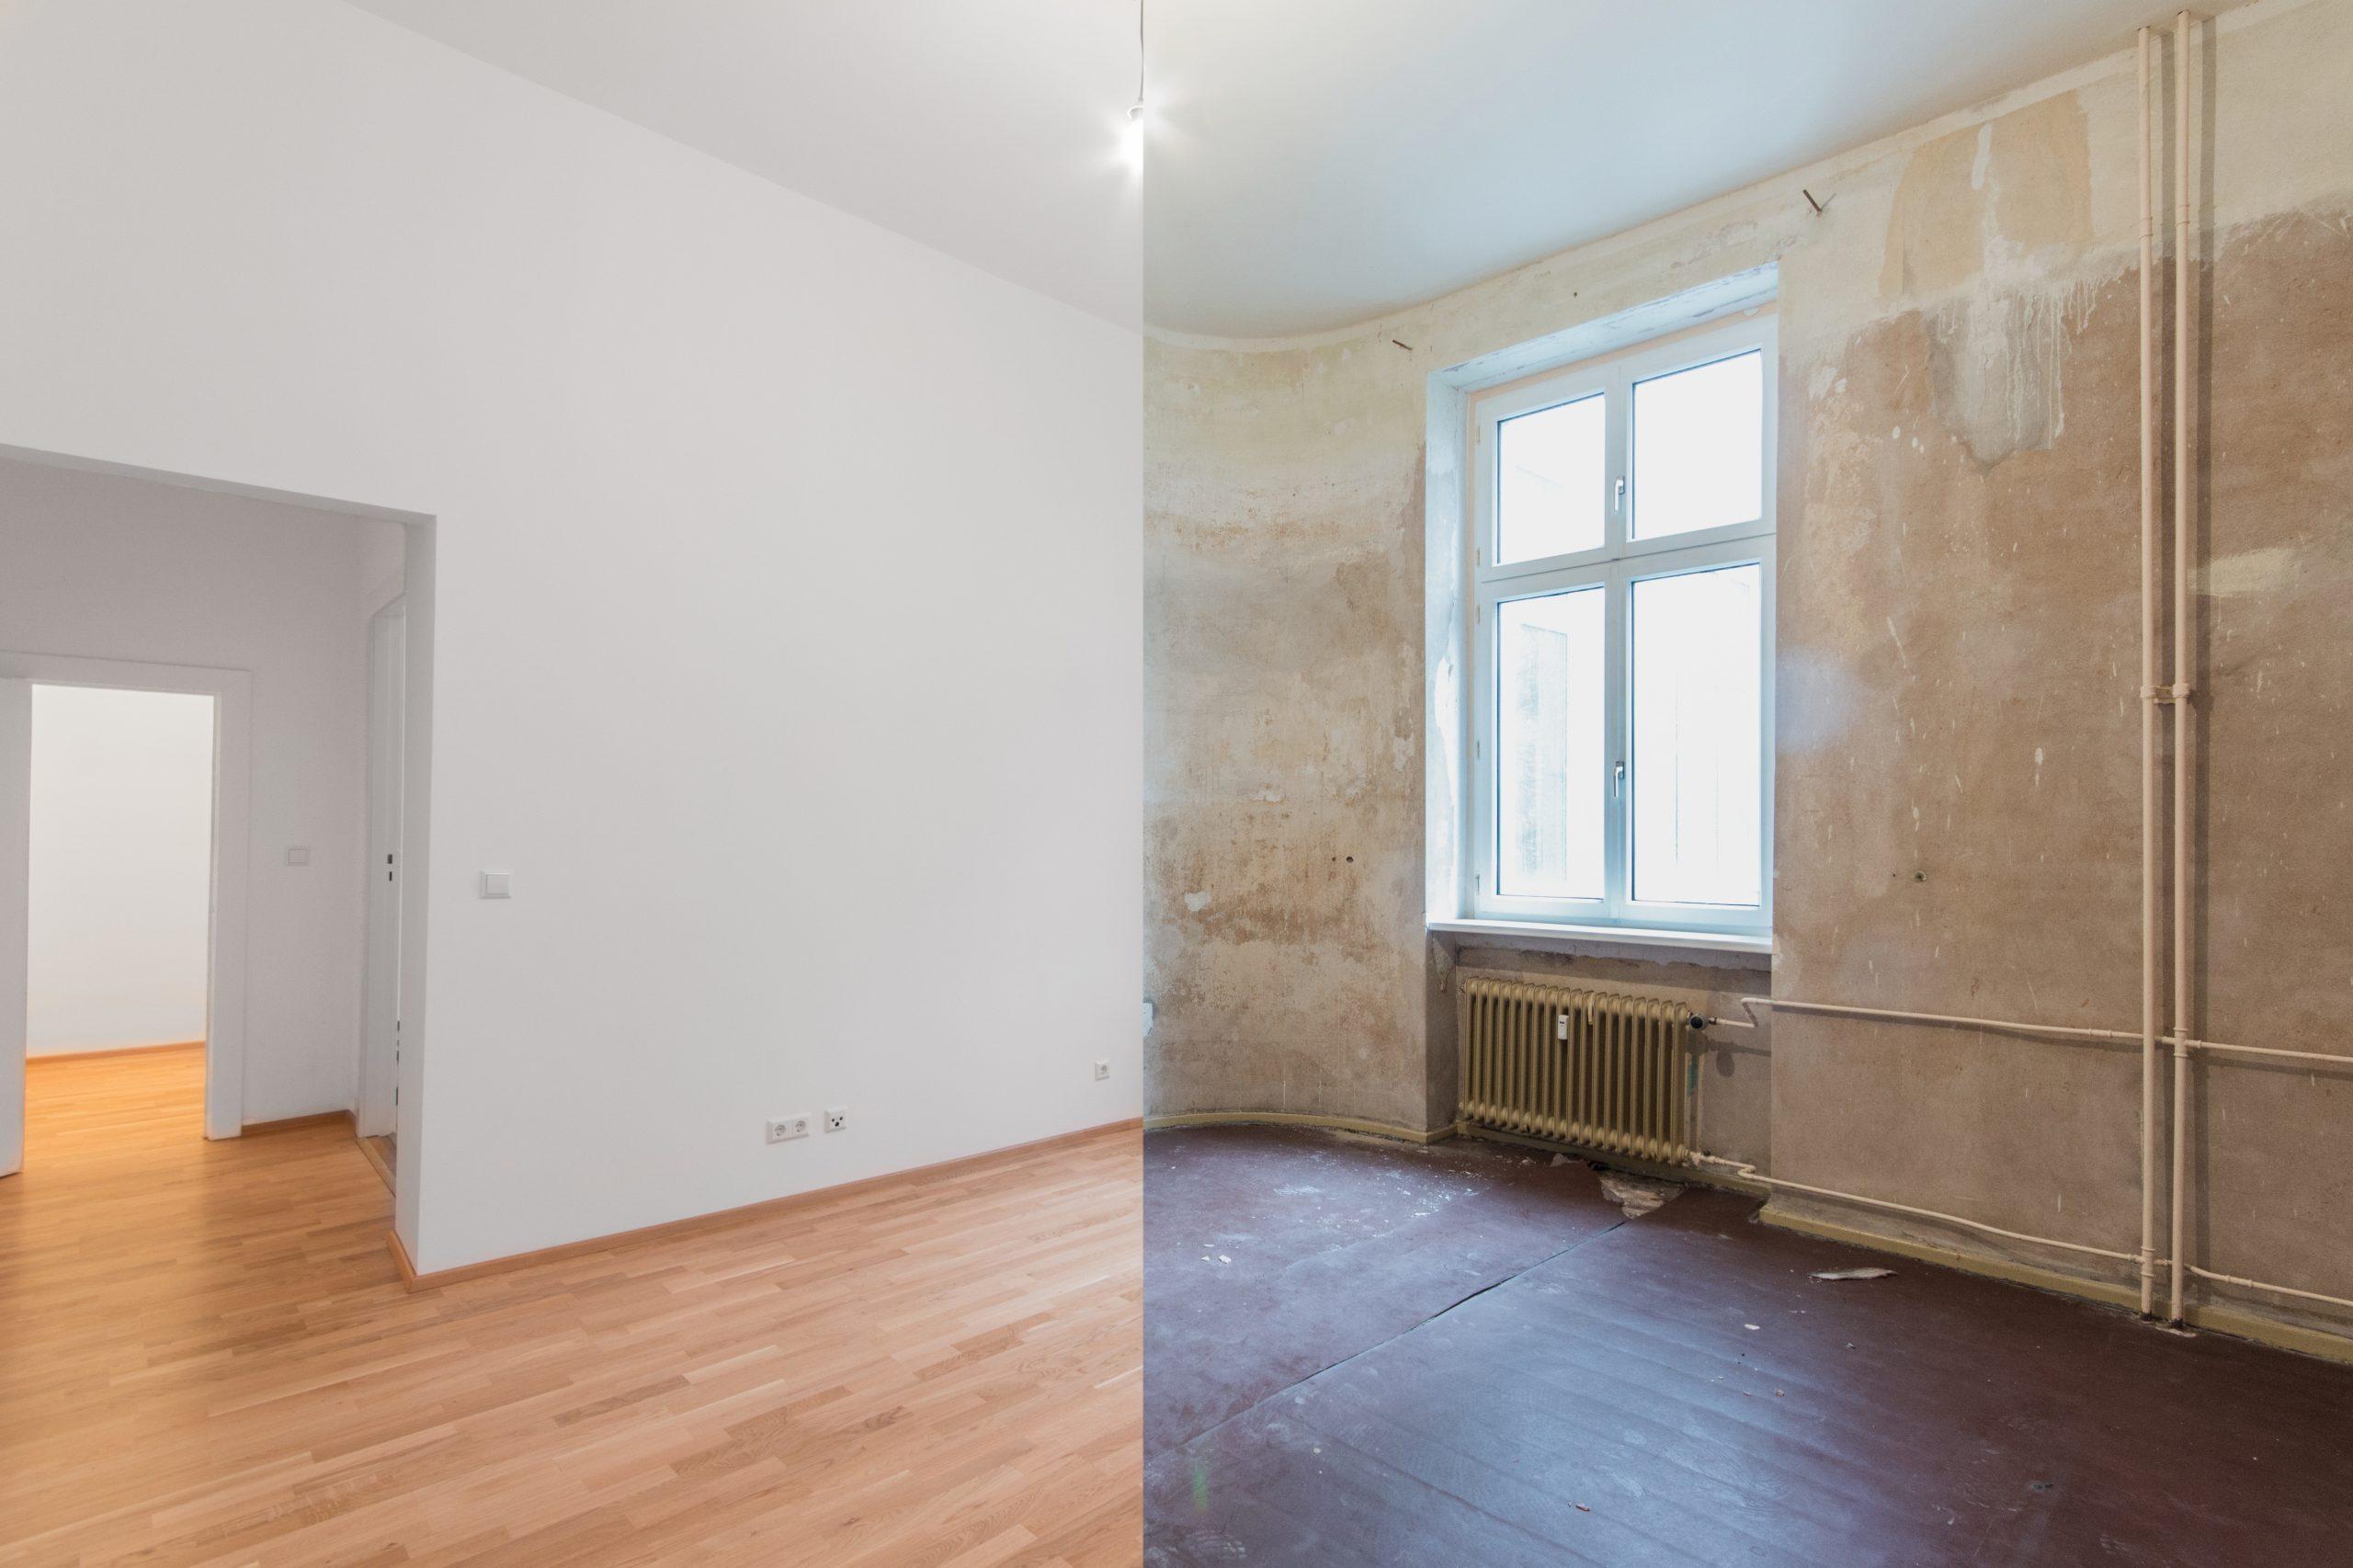 Rénovation salle